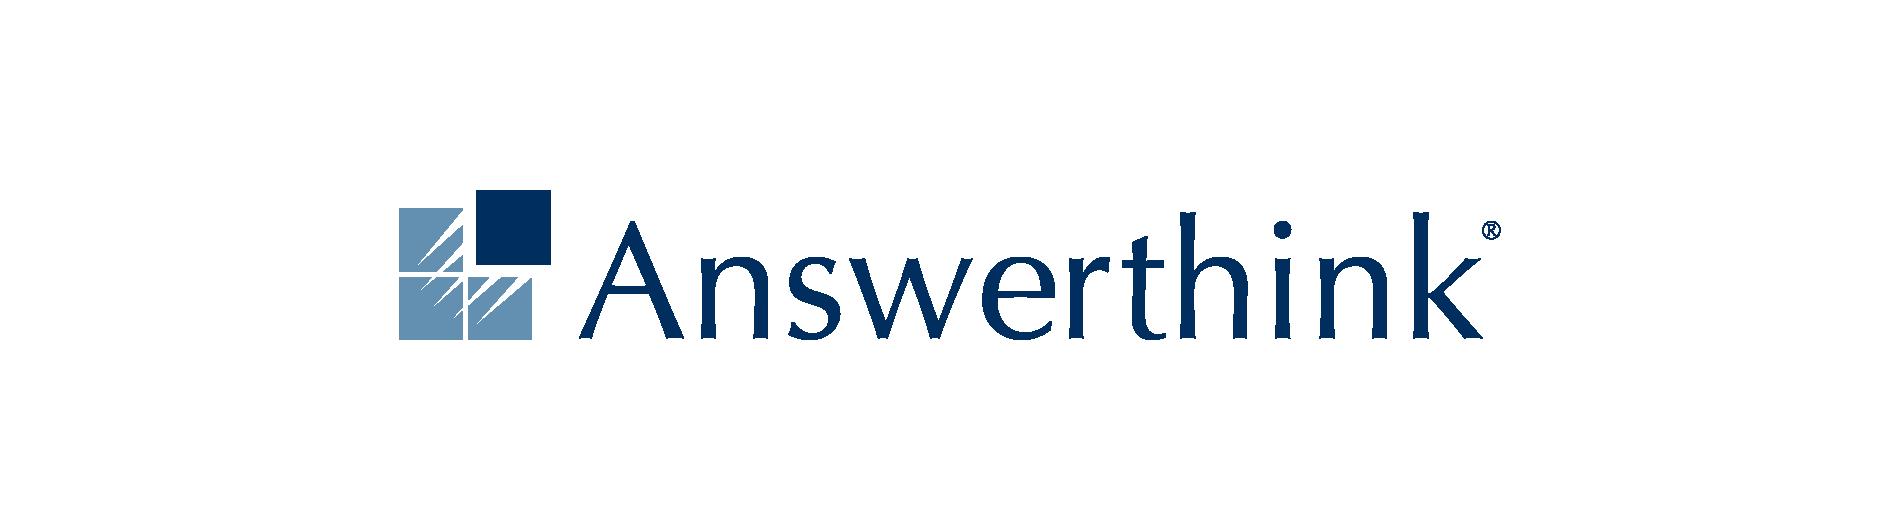 Answerthink Logo